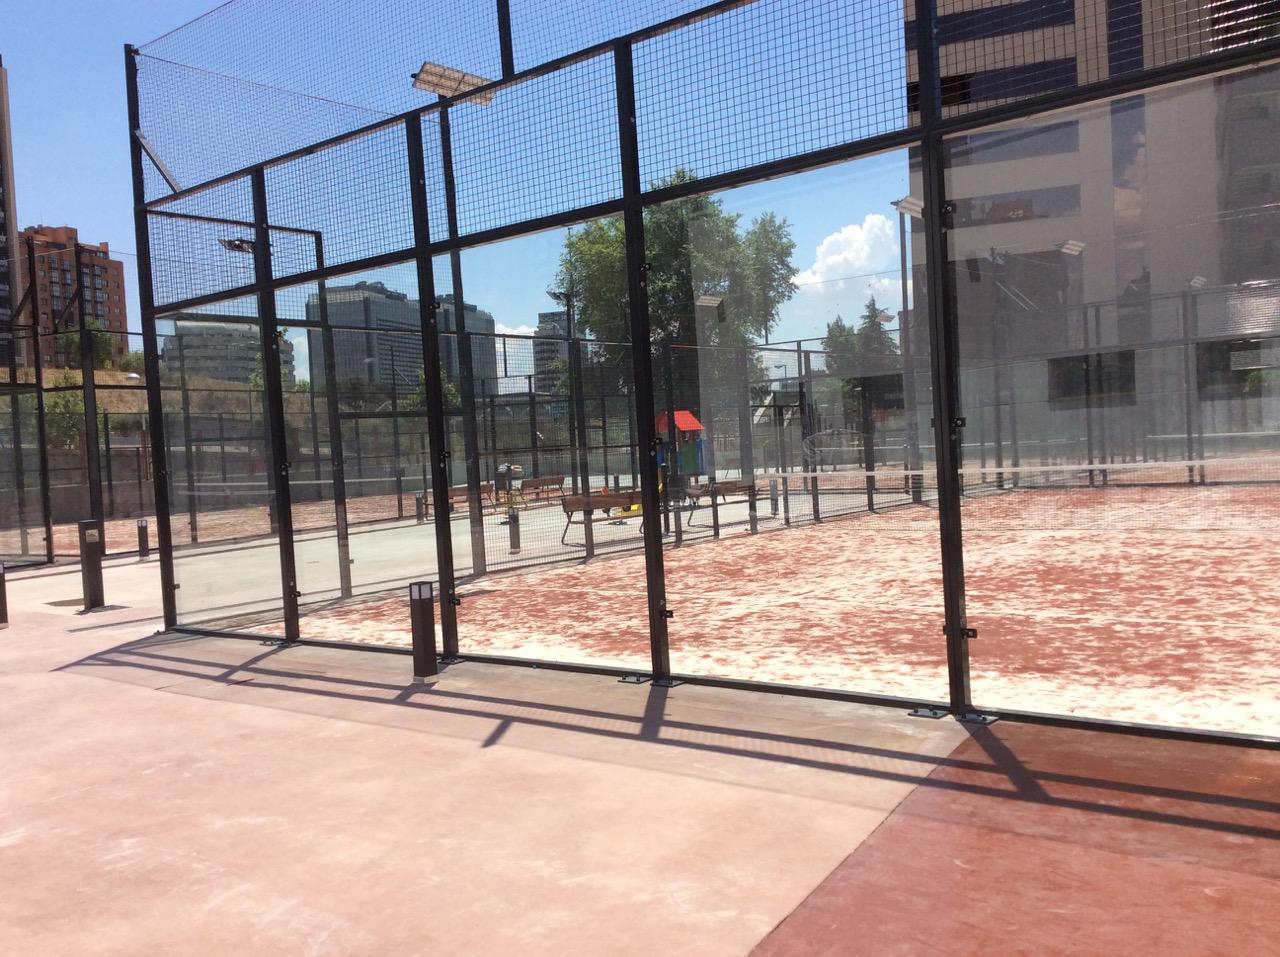 Oferta gimnasio zagros puerta europa madrid gymforless - Puerta europa almeria ...